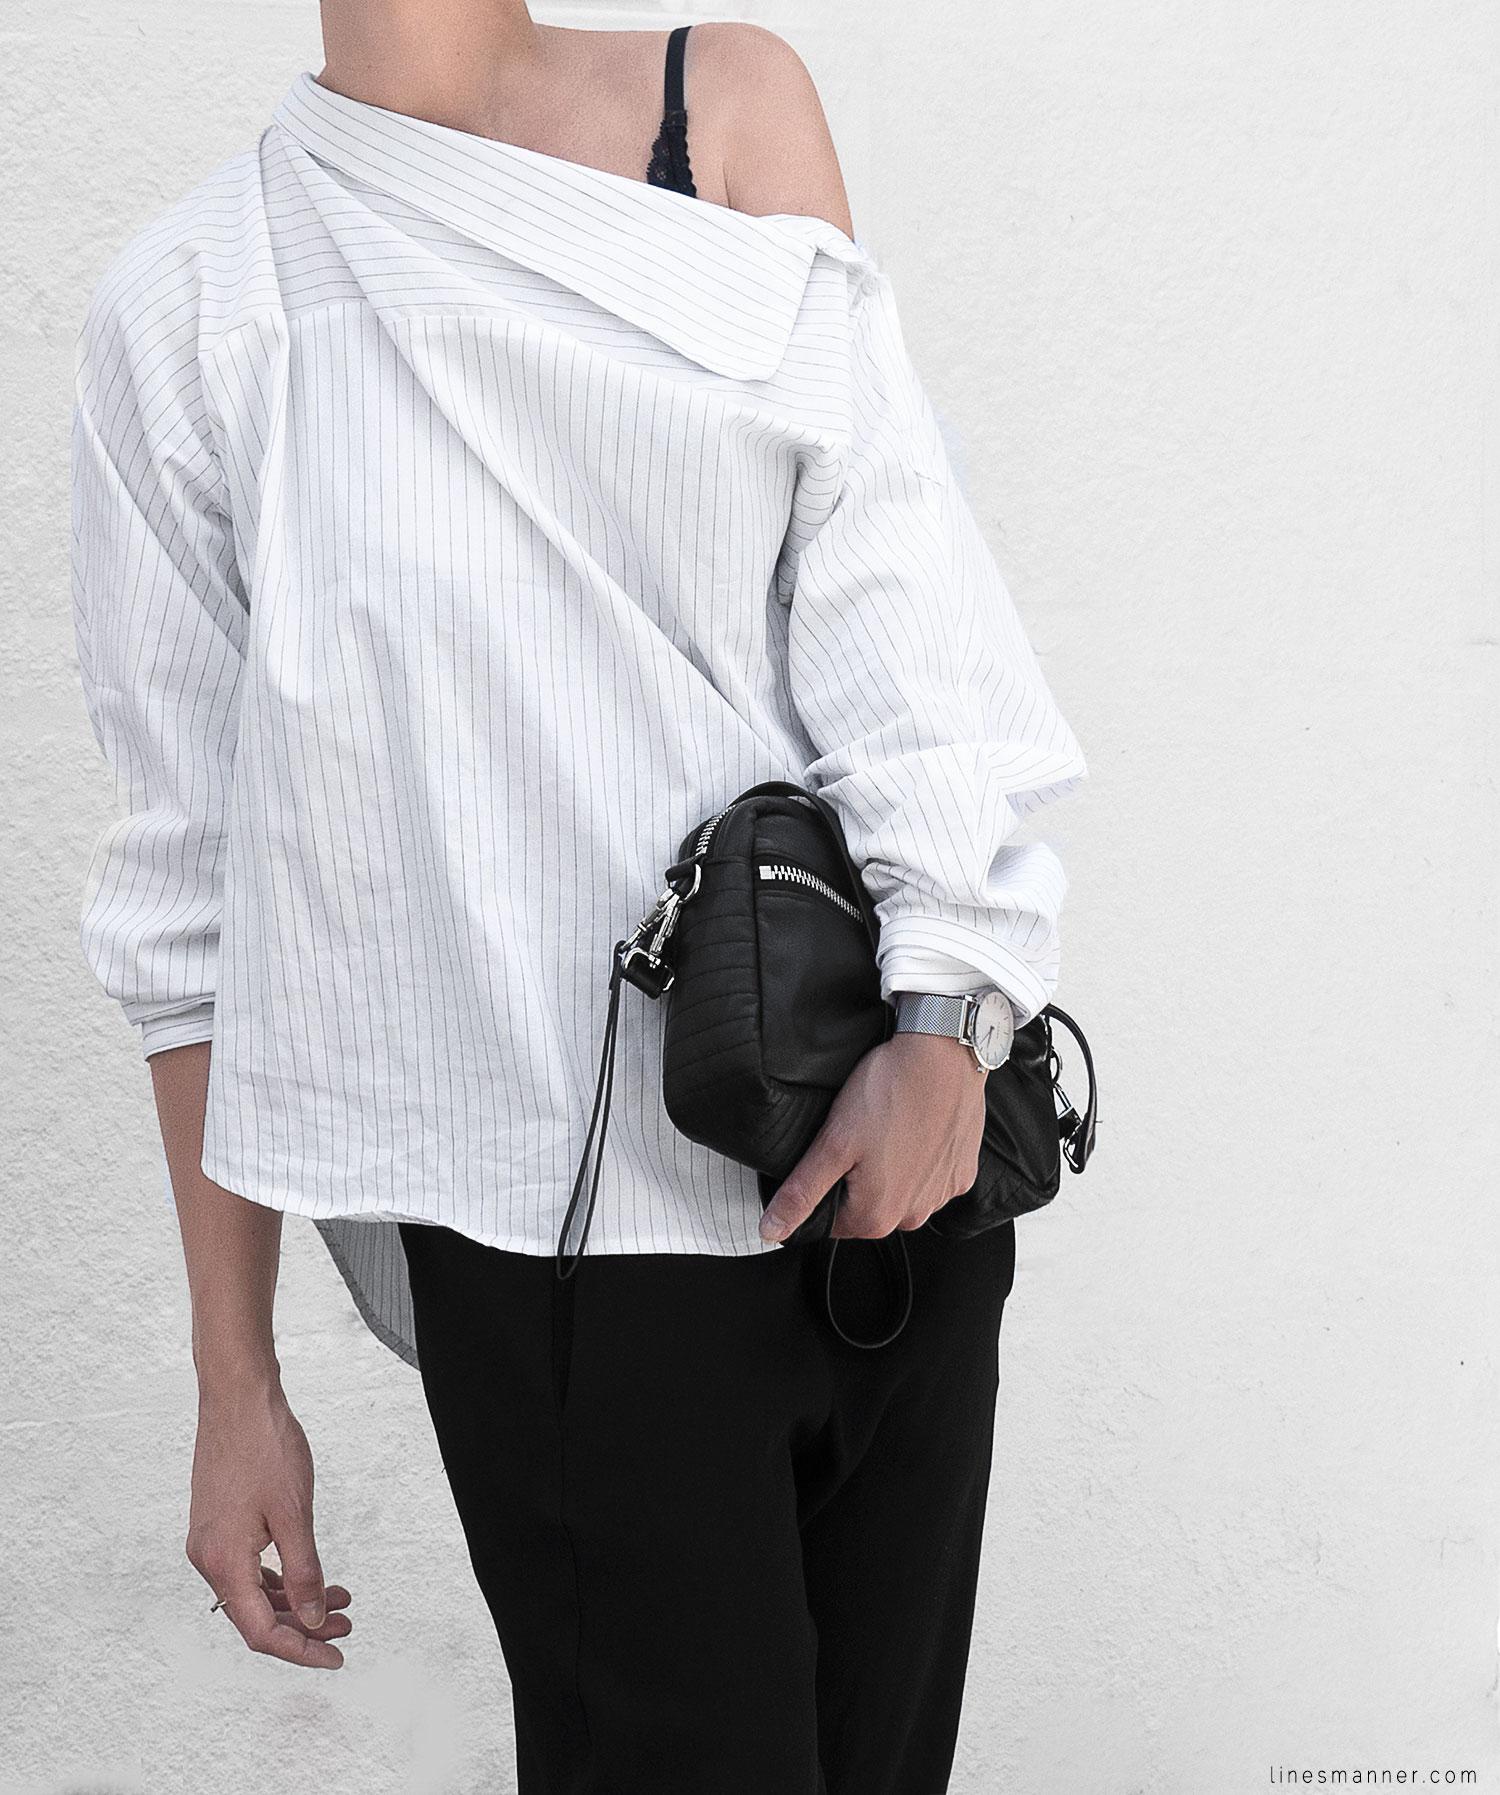 Lines-Manner-Simplicity-Off_shoulder-Monochrome-Noway_Monday-Details-Edgy6Backward-Sleek Statement_piece-Pinstripe-Business-Shirt-Minimal-Essentials-Outfit-Fashion-Minimal_fashion-Slides-Everlane-6